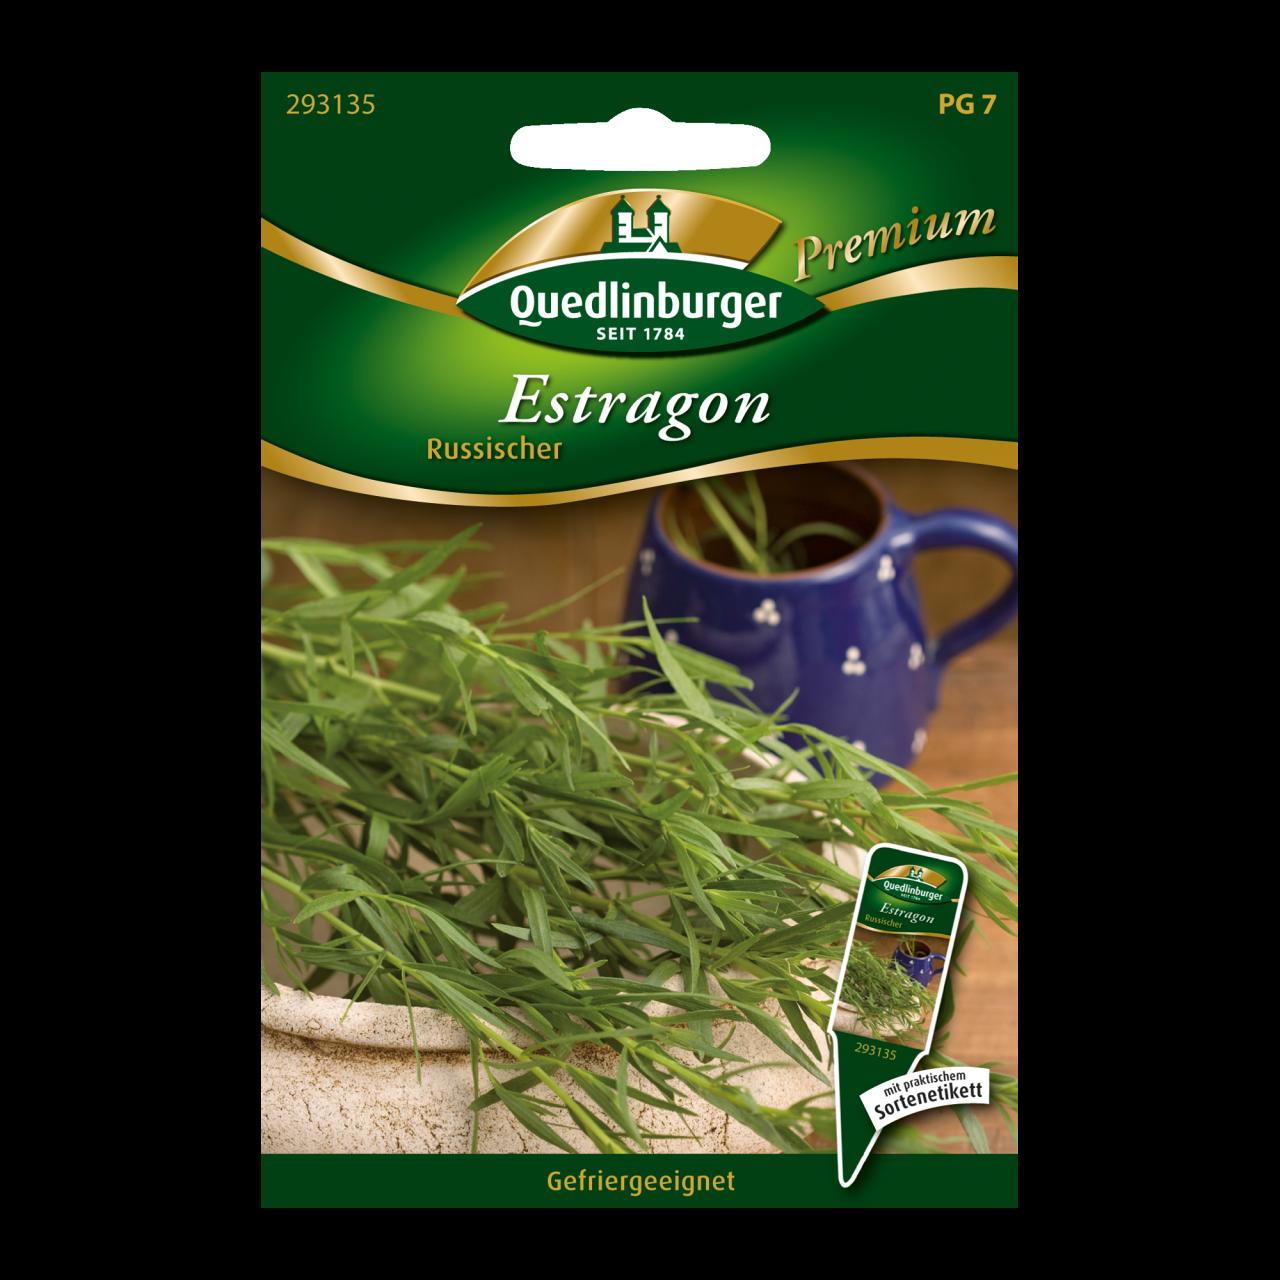 Quedlinburger Saatgut Estragon Vorderseite